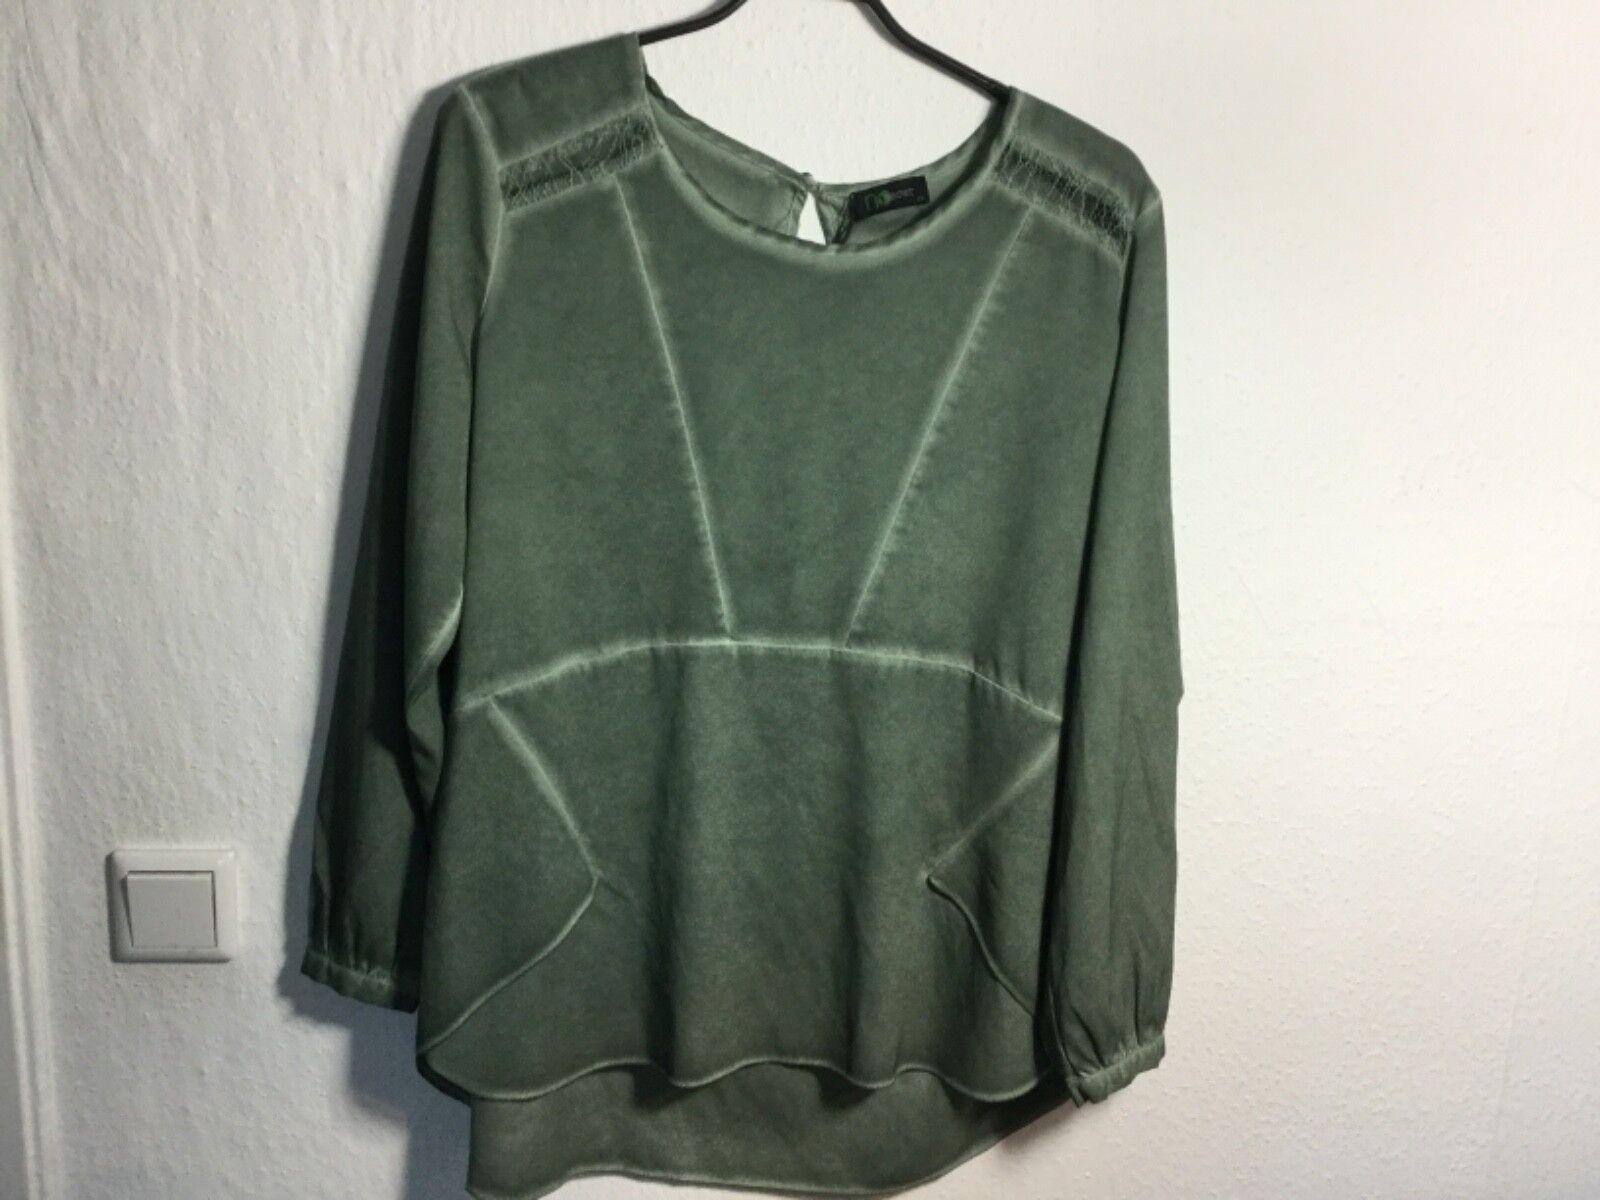 NO SECRET Blause Blausenshirt Tunika in grün Gr. 46 Damen NEU